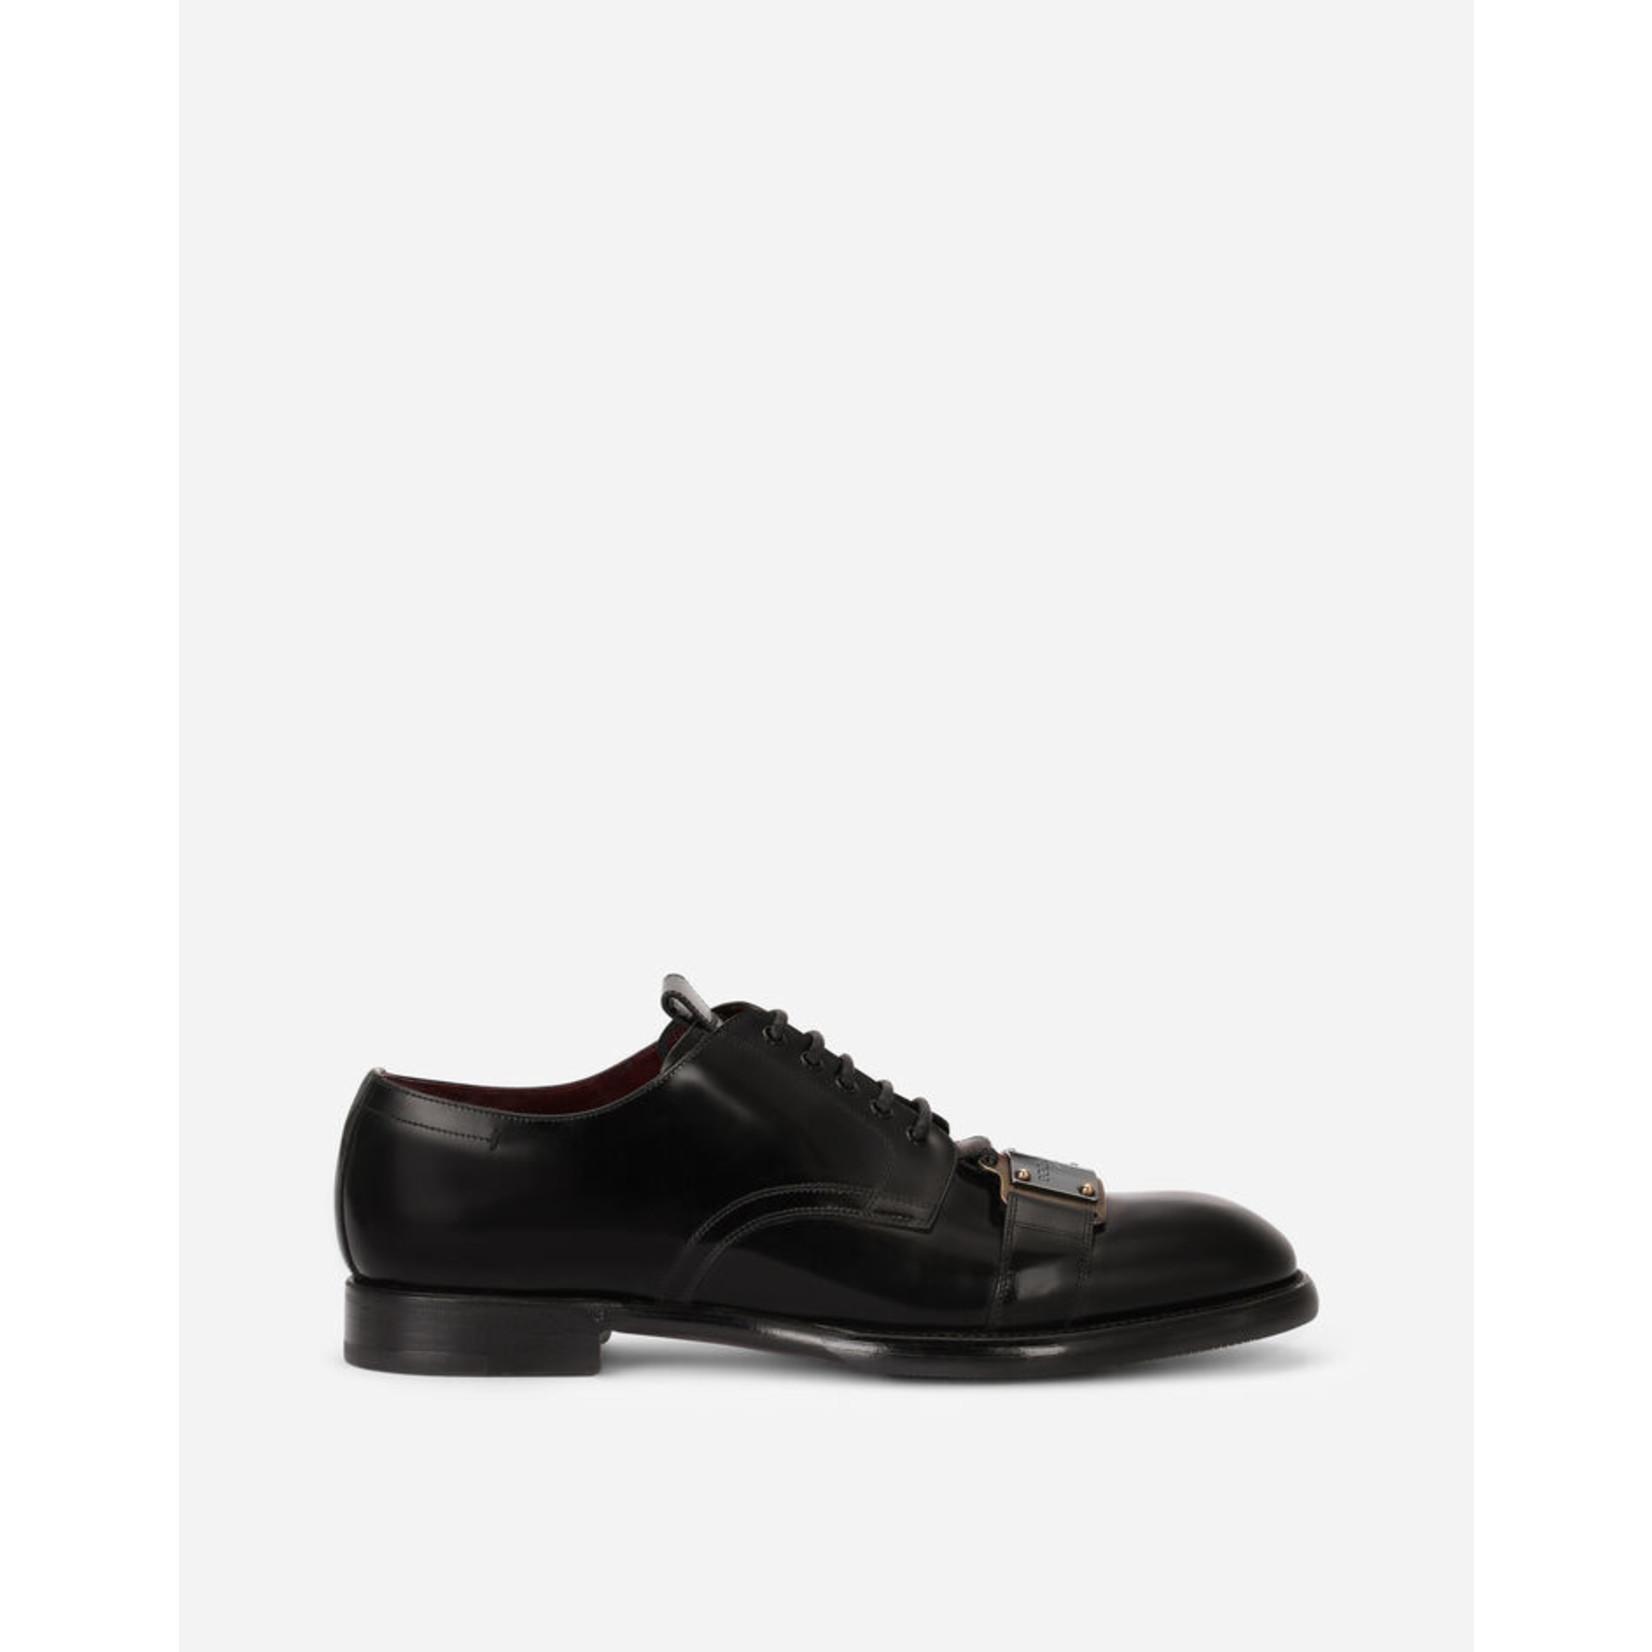 Dolce&Gabbana schoenen Schoenen 42649